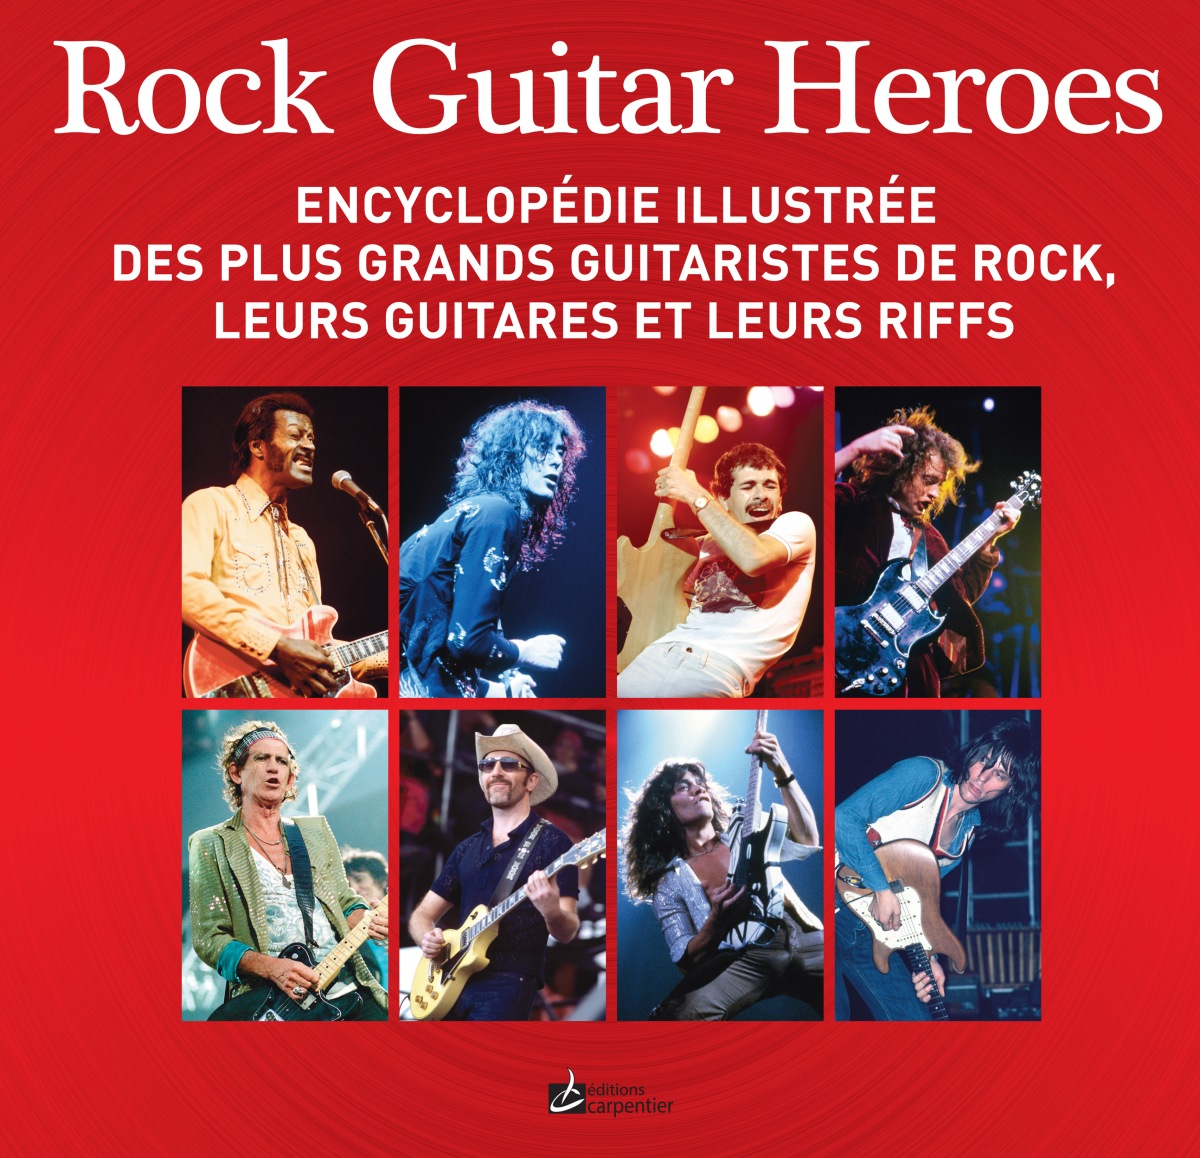 Editions Carpentier, Rock Guitar Heroes